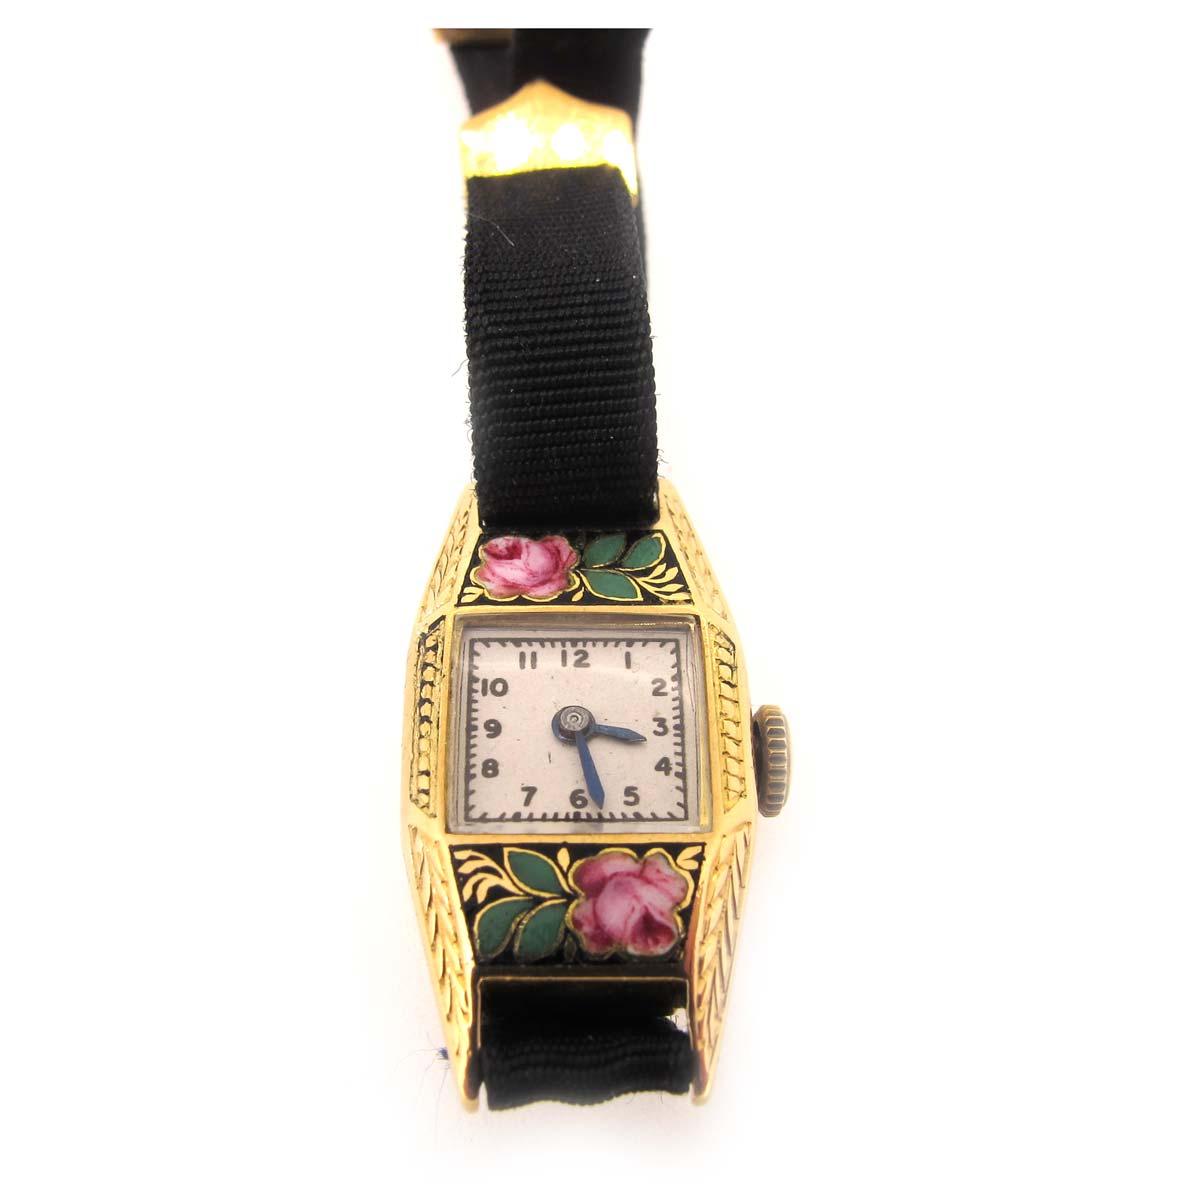 Antique gold & enamel wristwatch